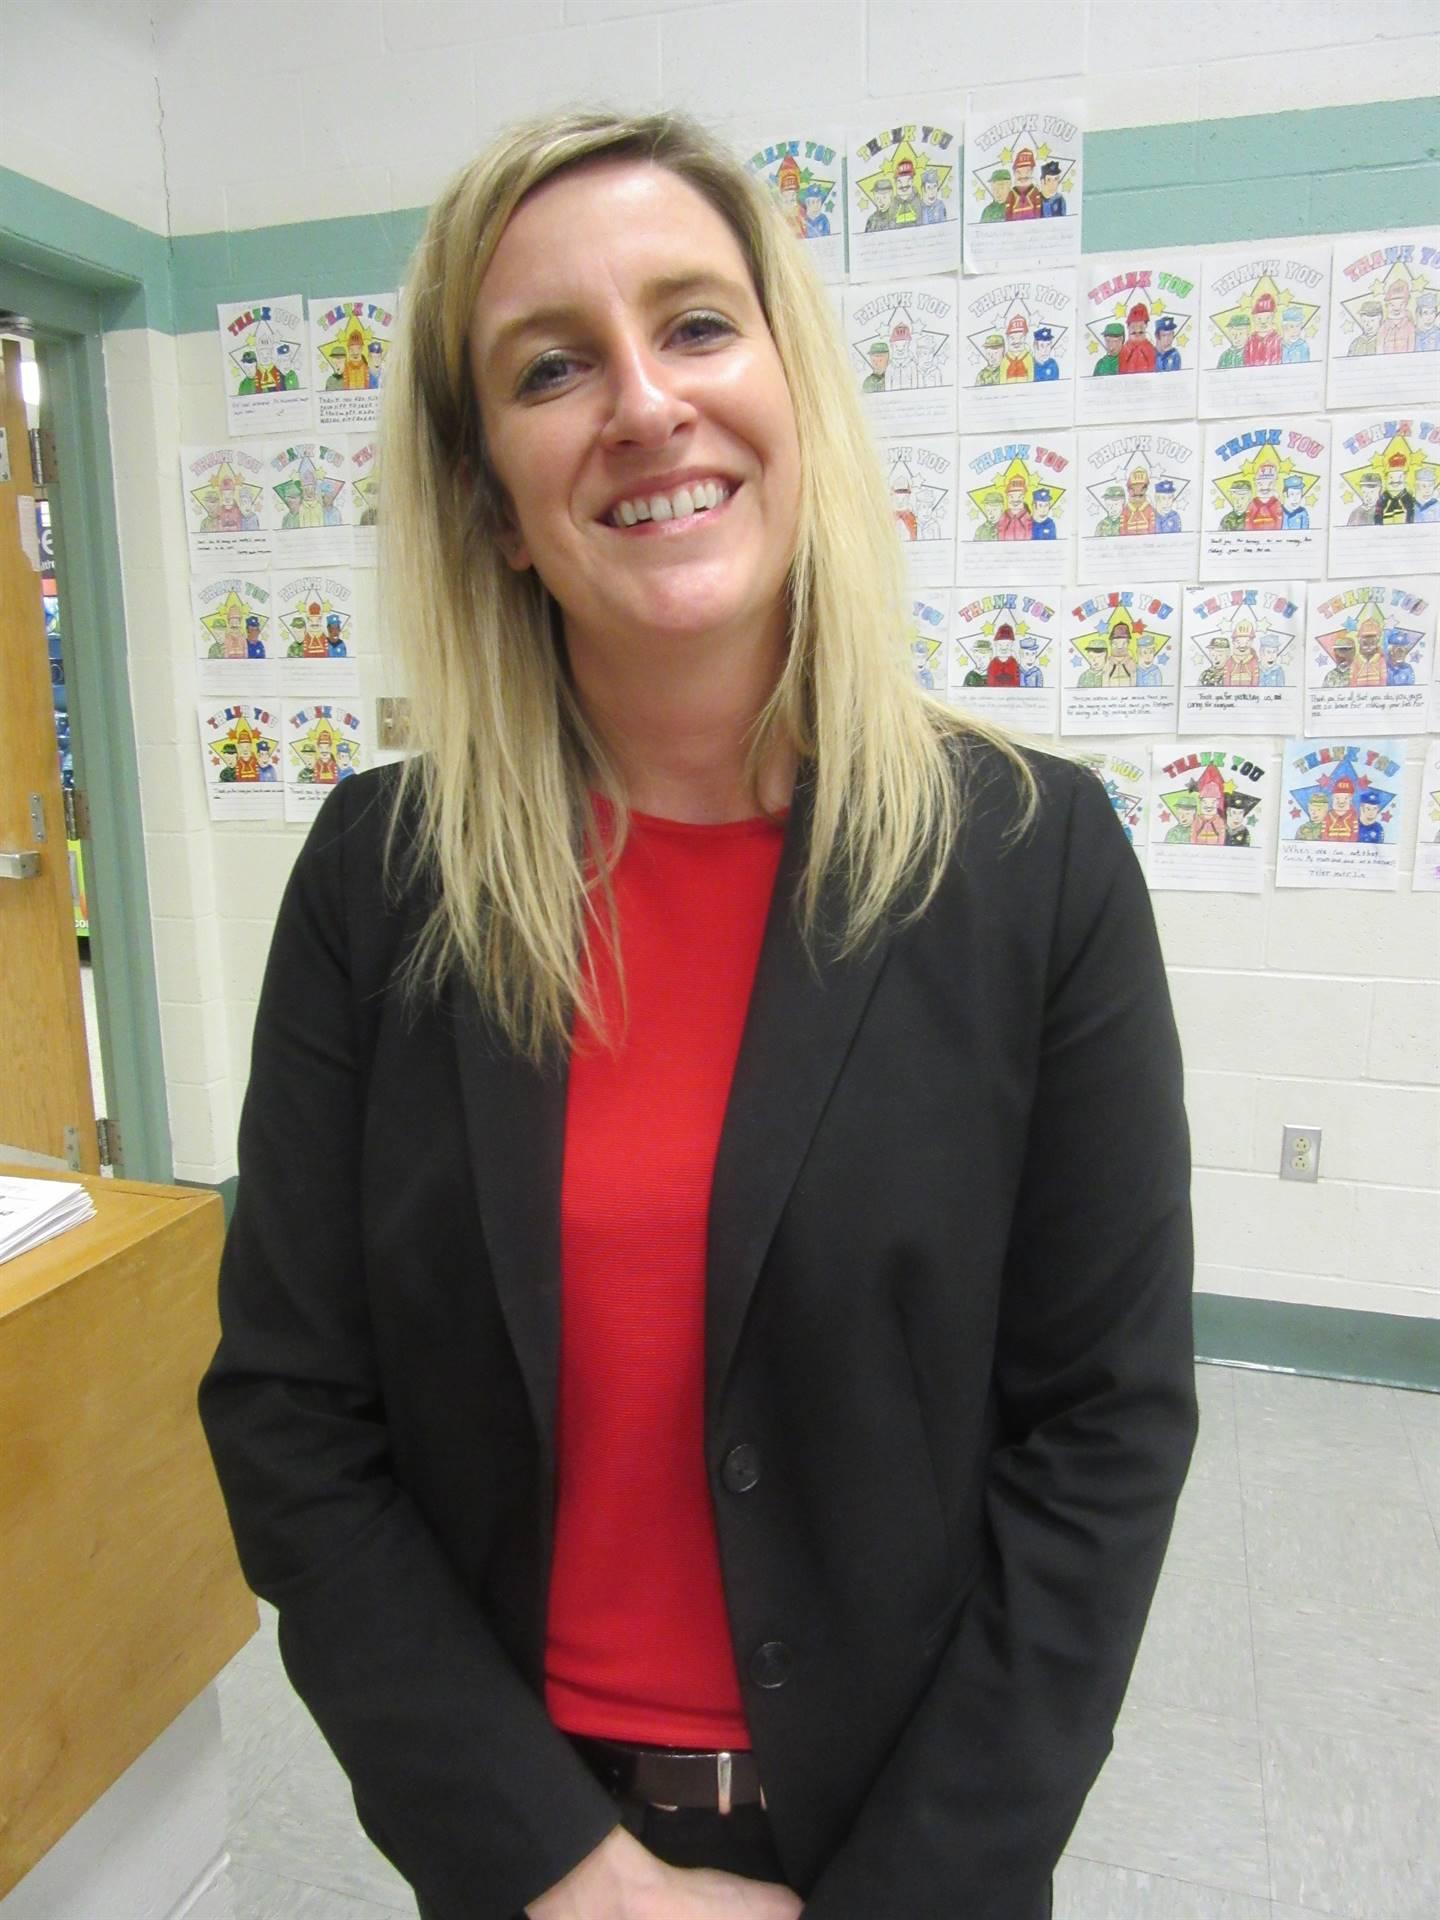 Assistant Principal Merwin